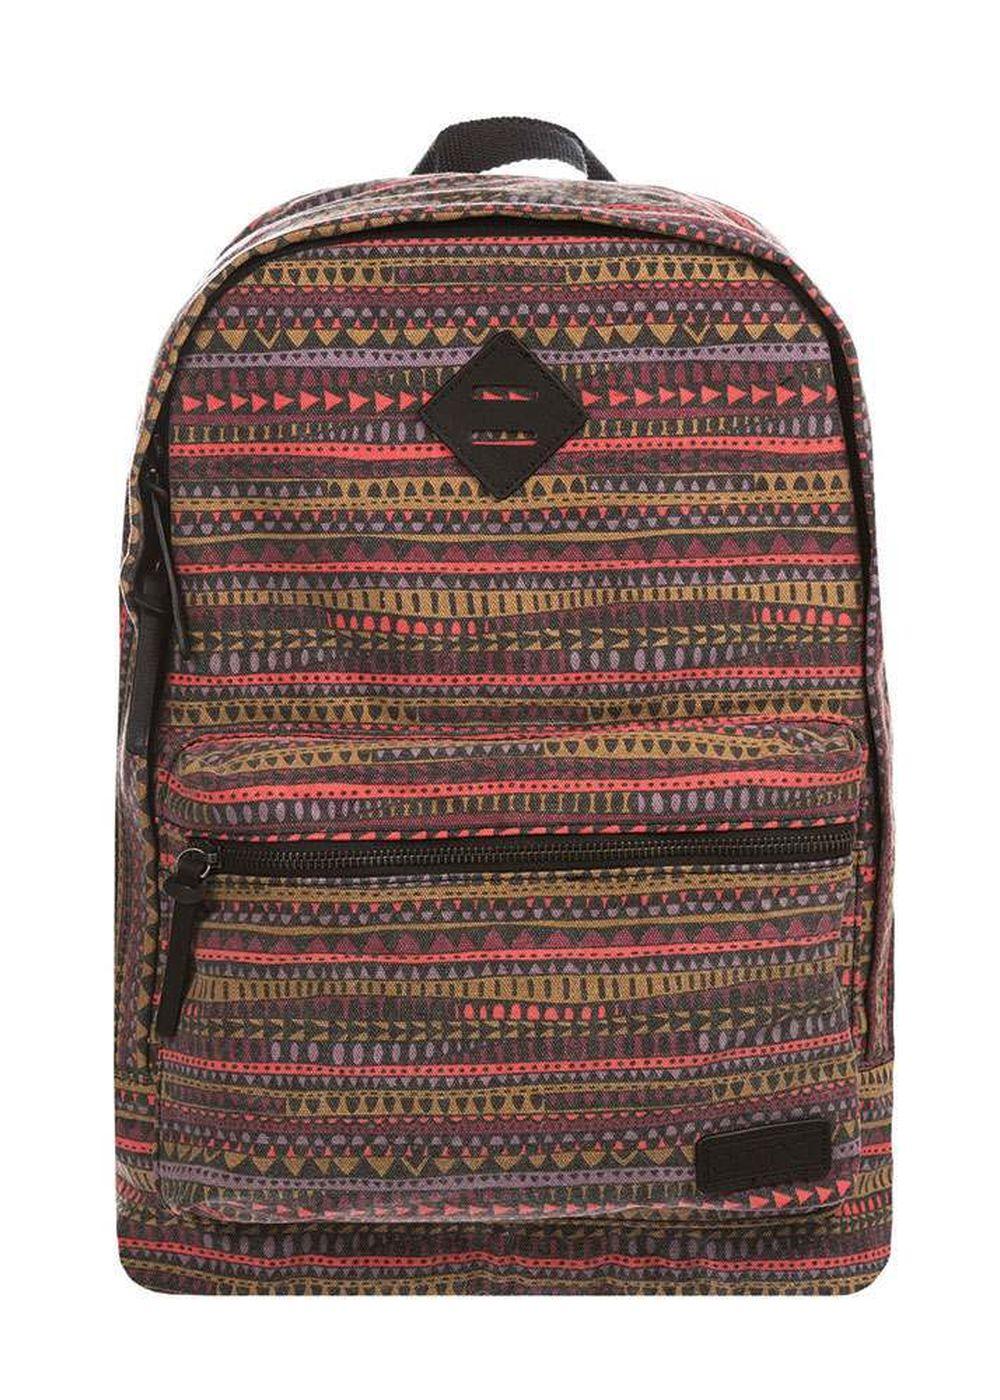 animal burst backpack bordeaux red